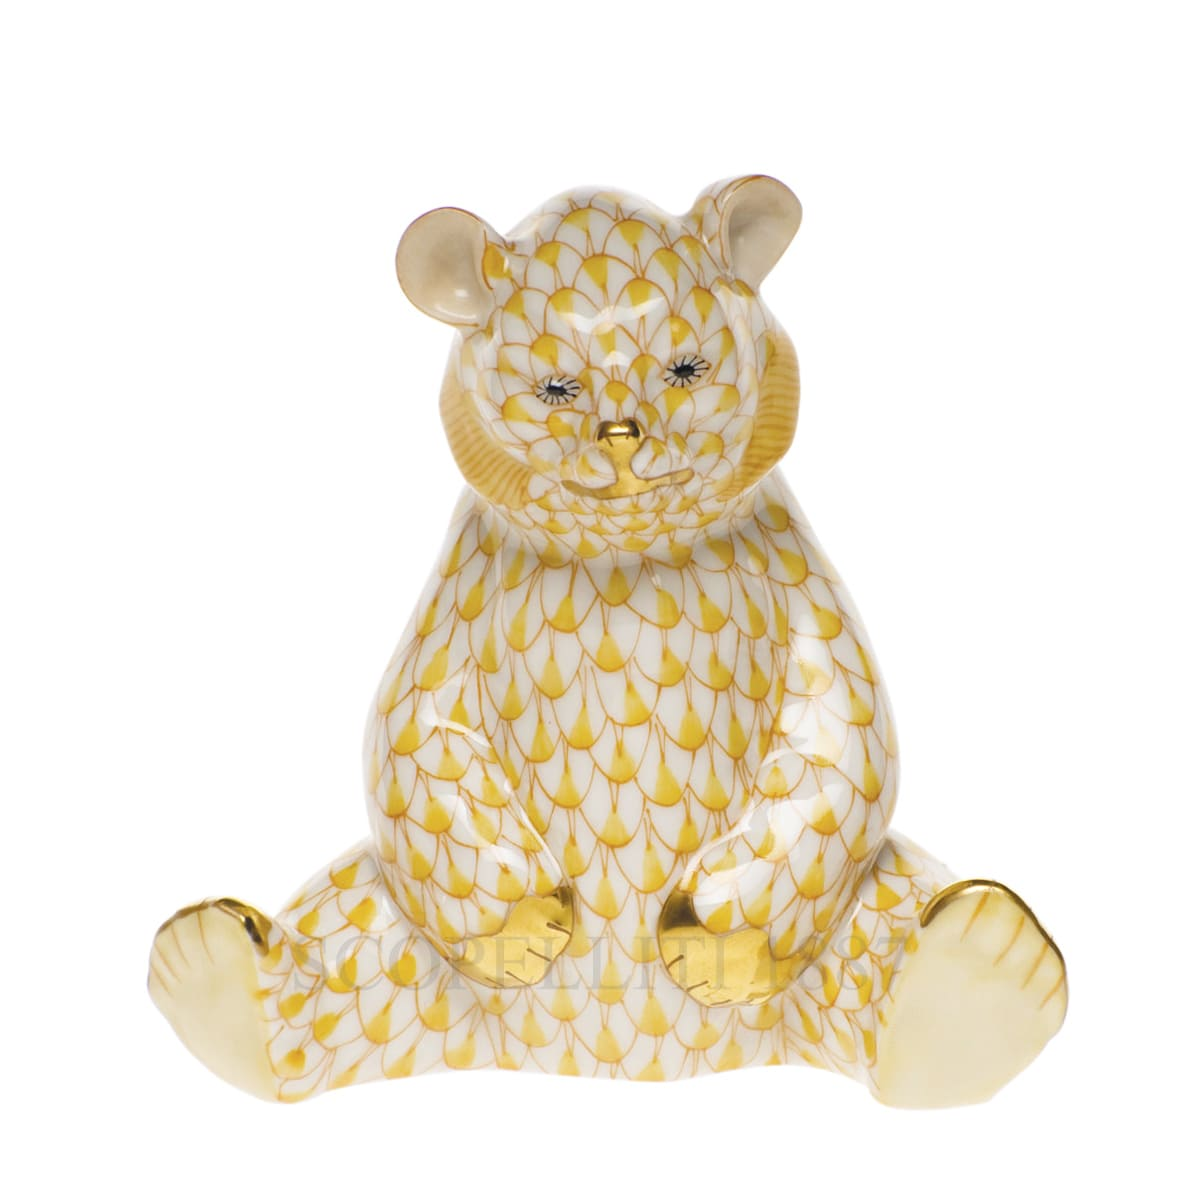 herend porcelain sitting bear figurine yellow